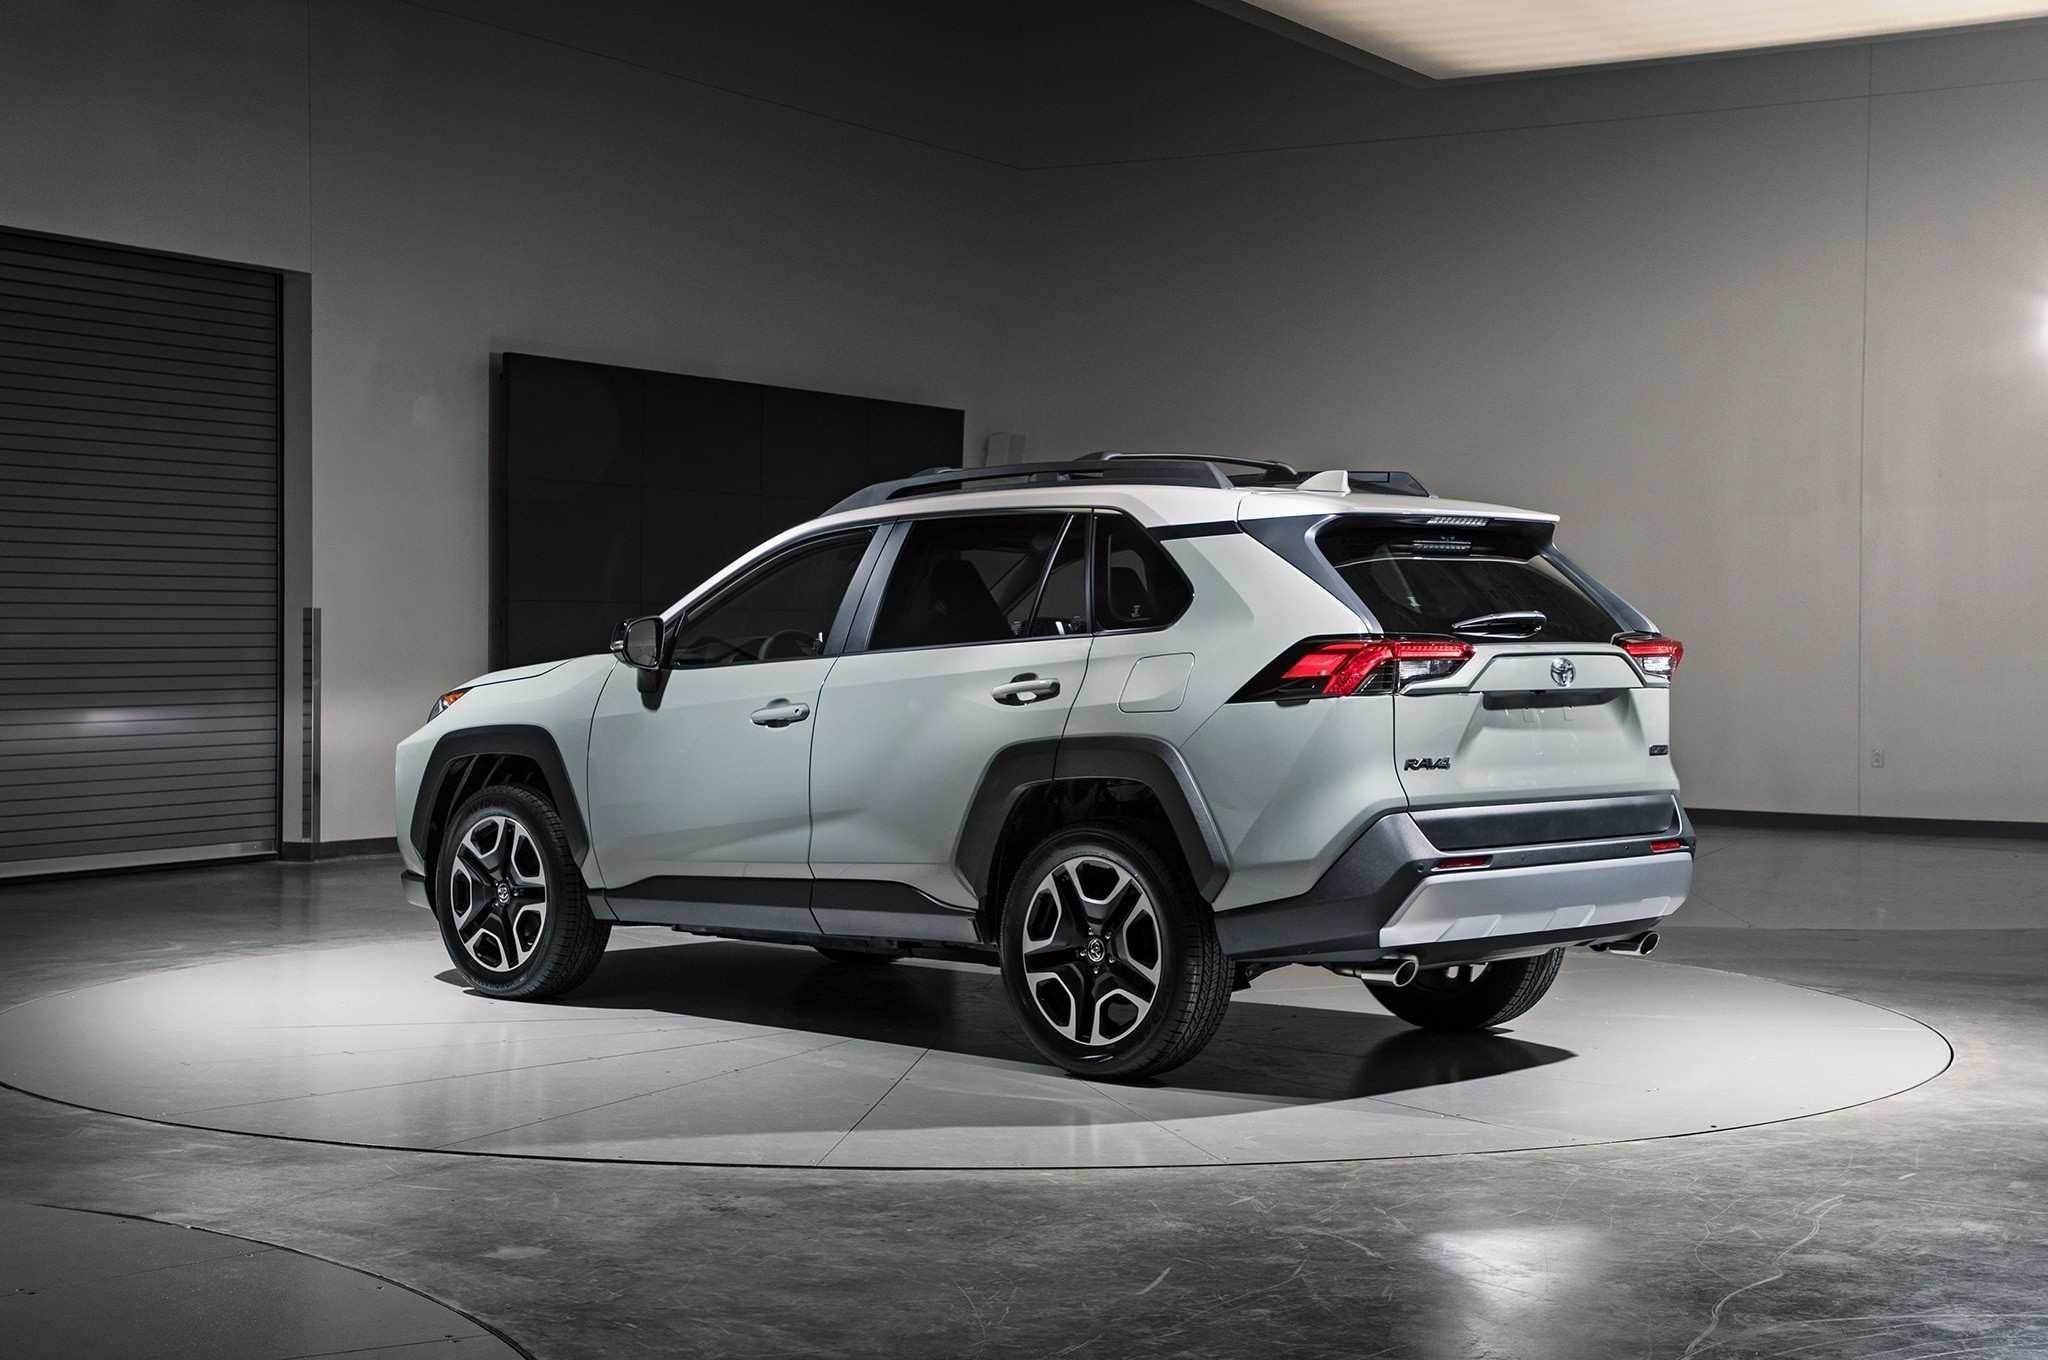 47 Best Review The Rav Toyota 2019 Price Specs Redesign by The Rav Toyota 2019 Price Specs